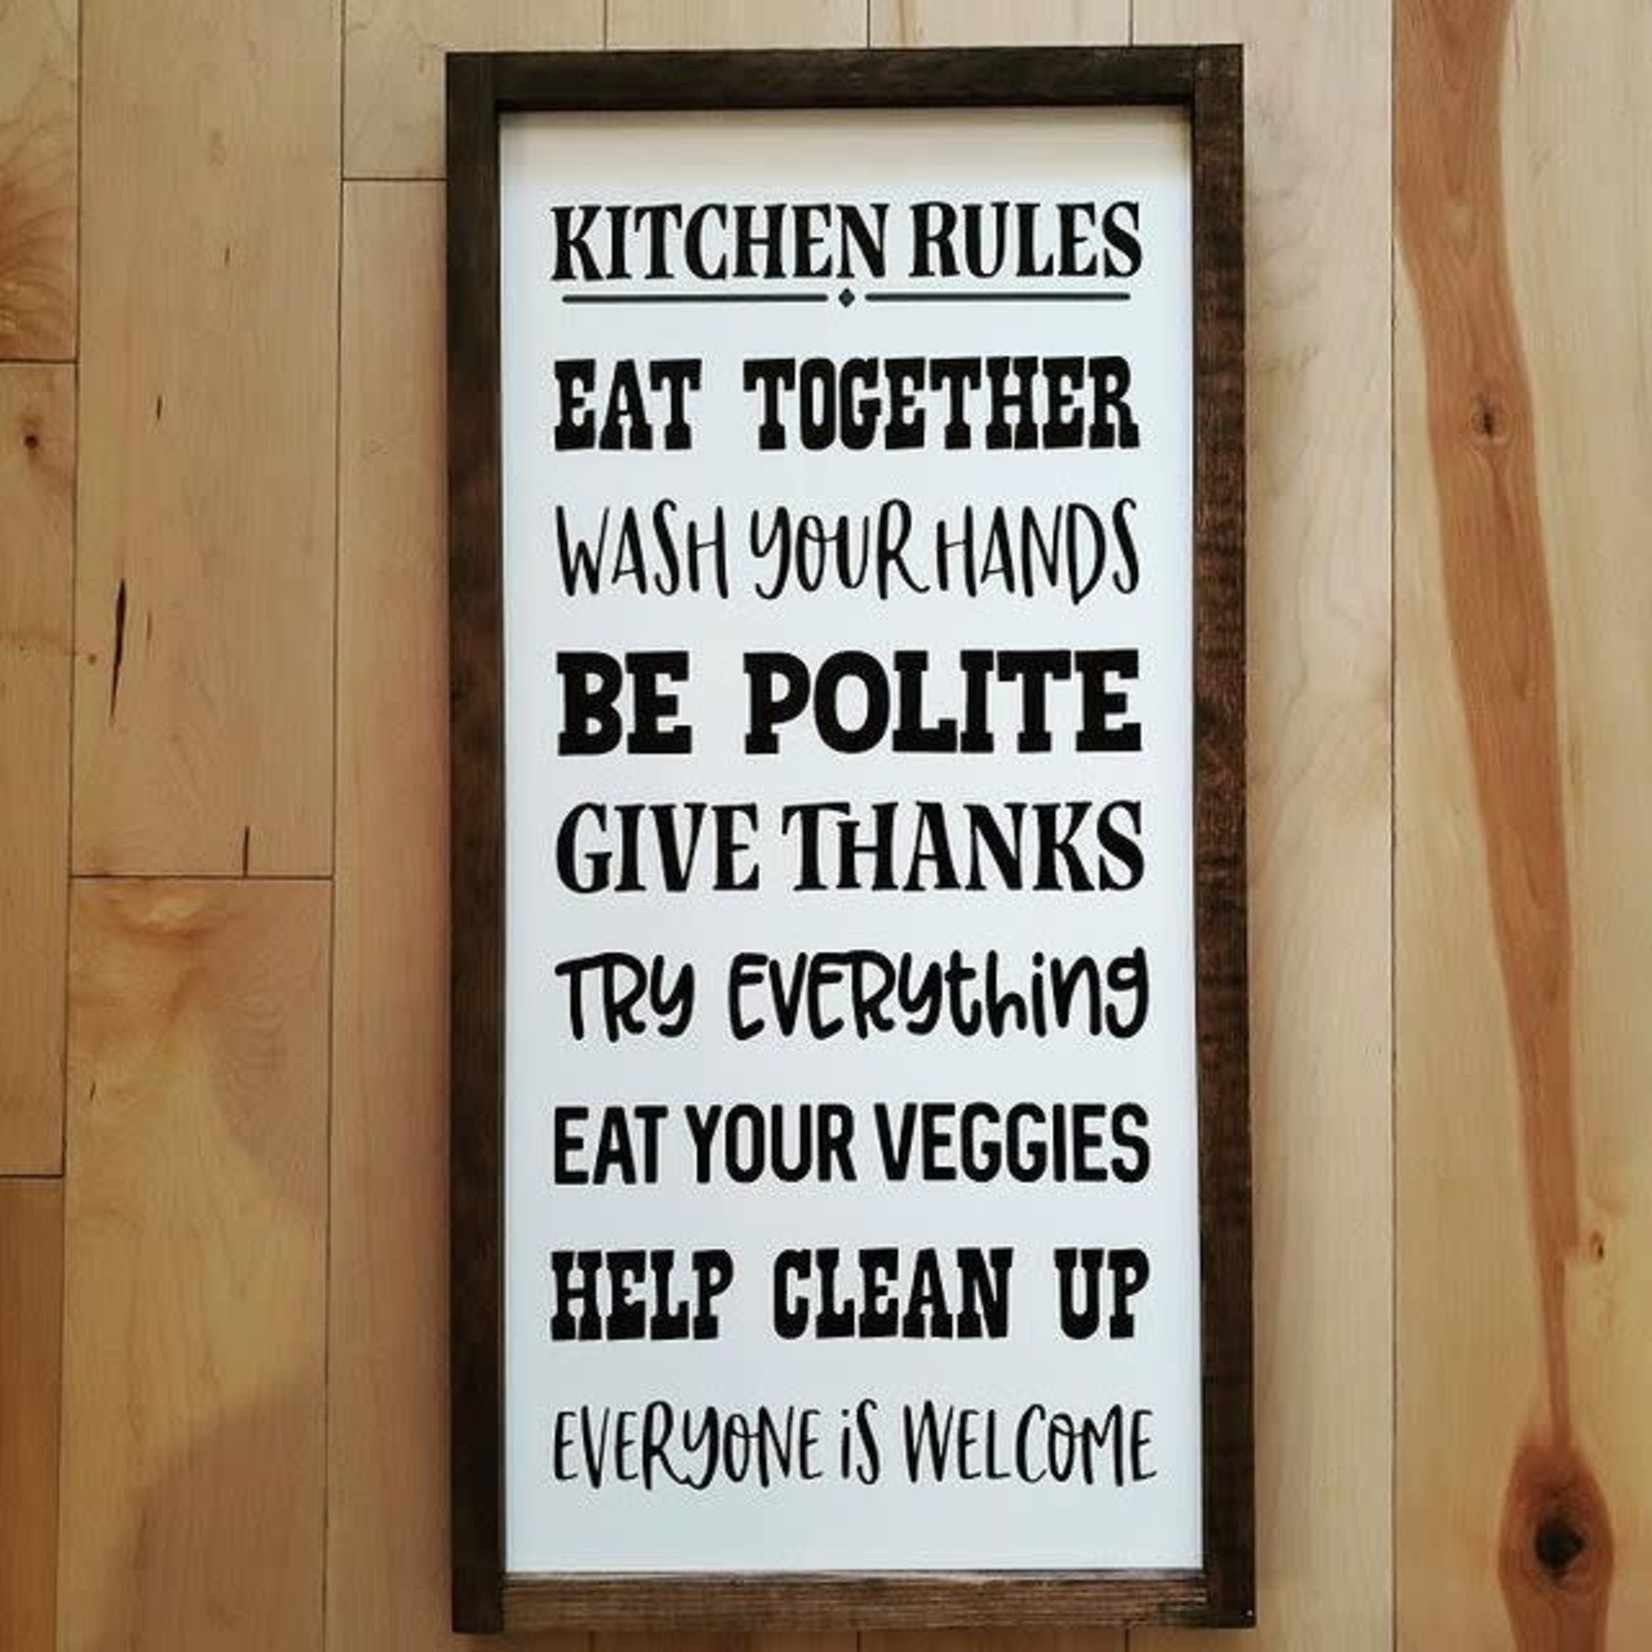 "Kitchen rules 12x24"" framed sign"